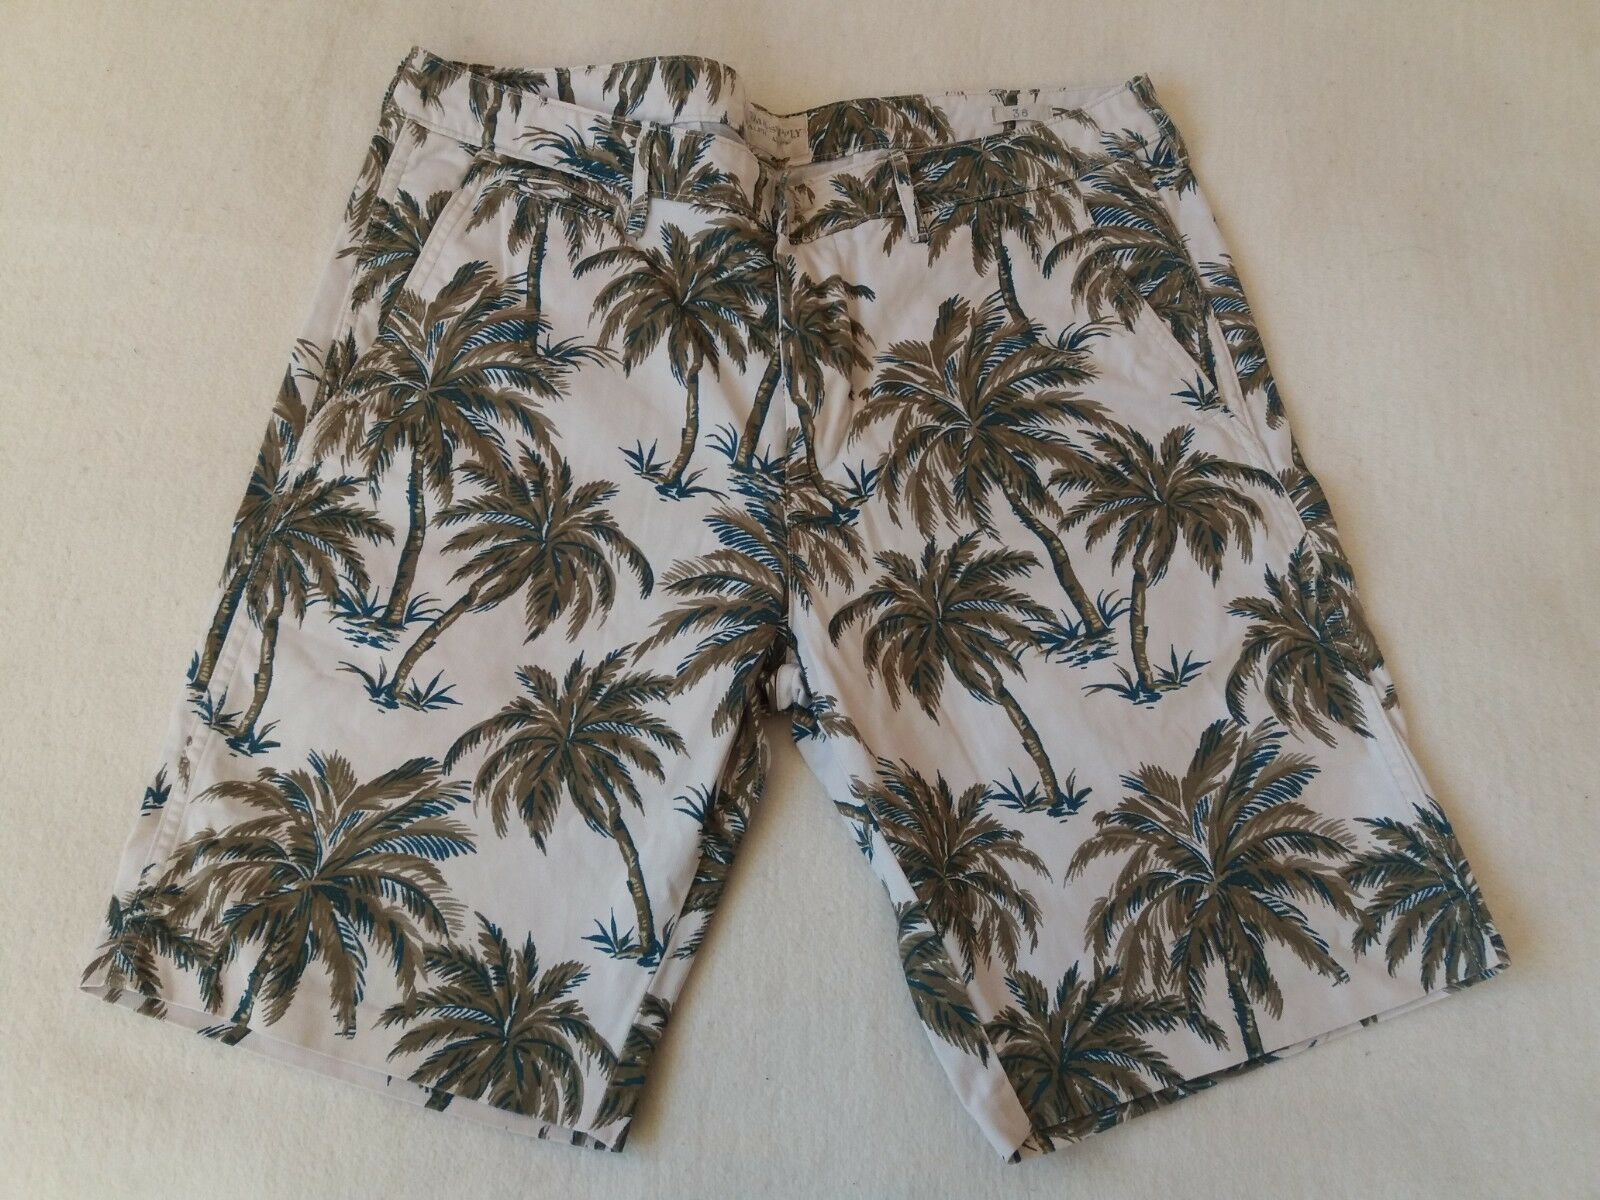 Men's Denim & Supply Ralph Lauren Shorts UK Size 36 Good Condition